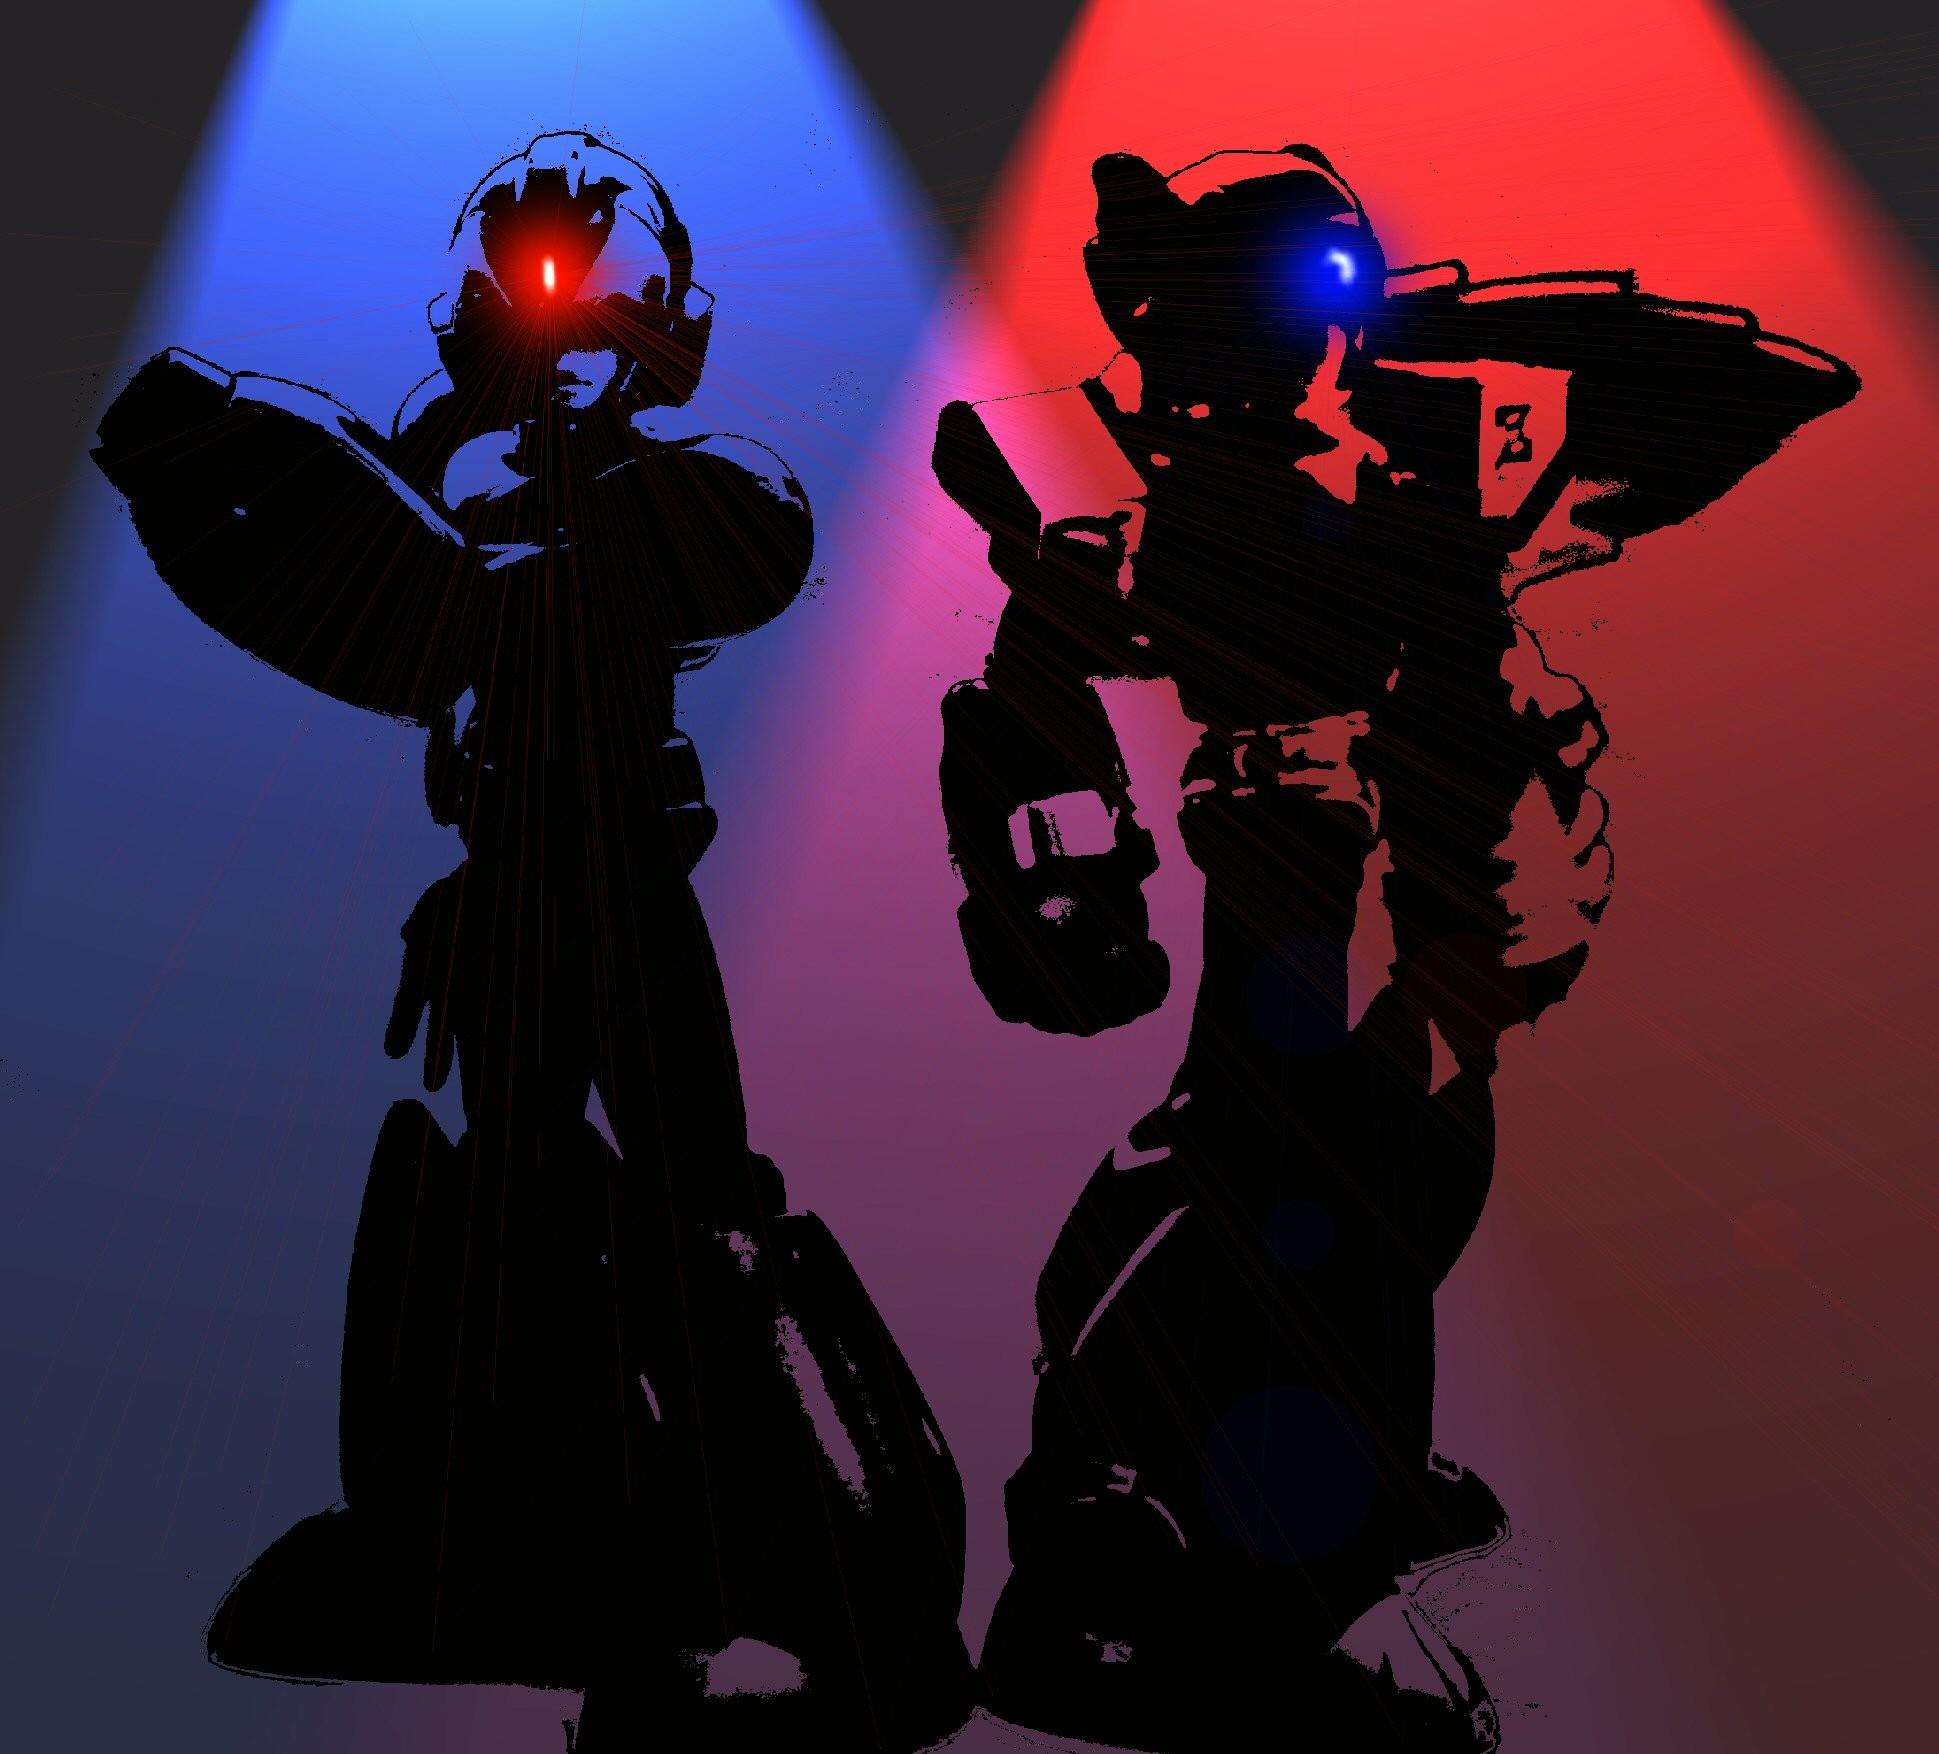 Mega_Man_X_and_Zero.jpg